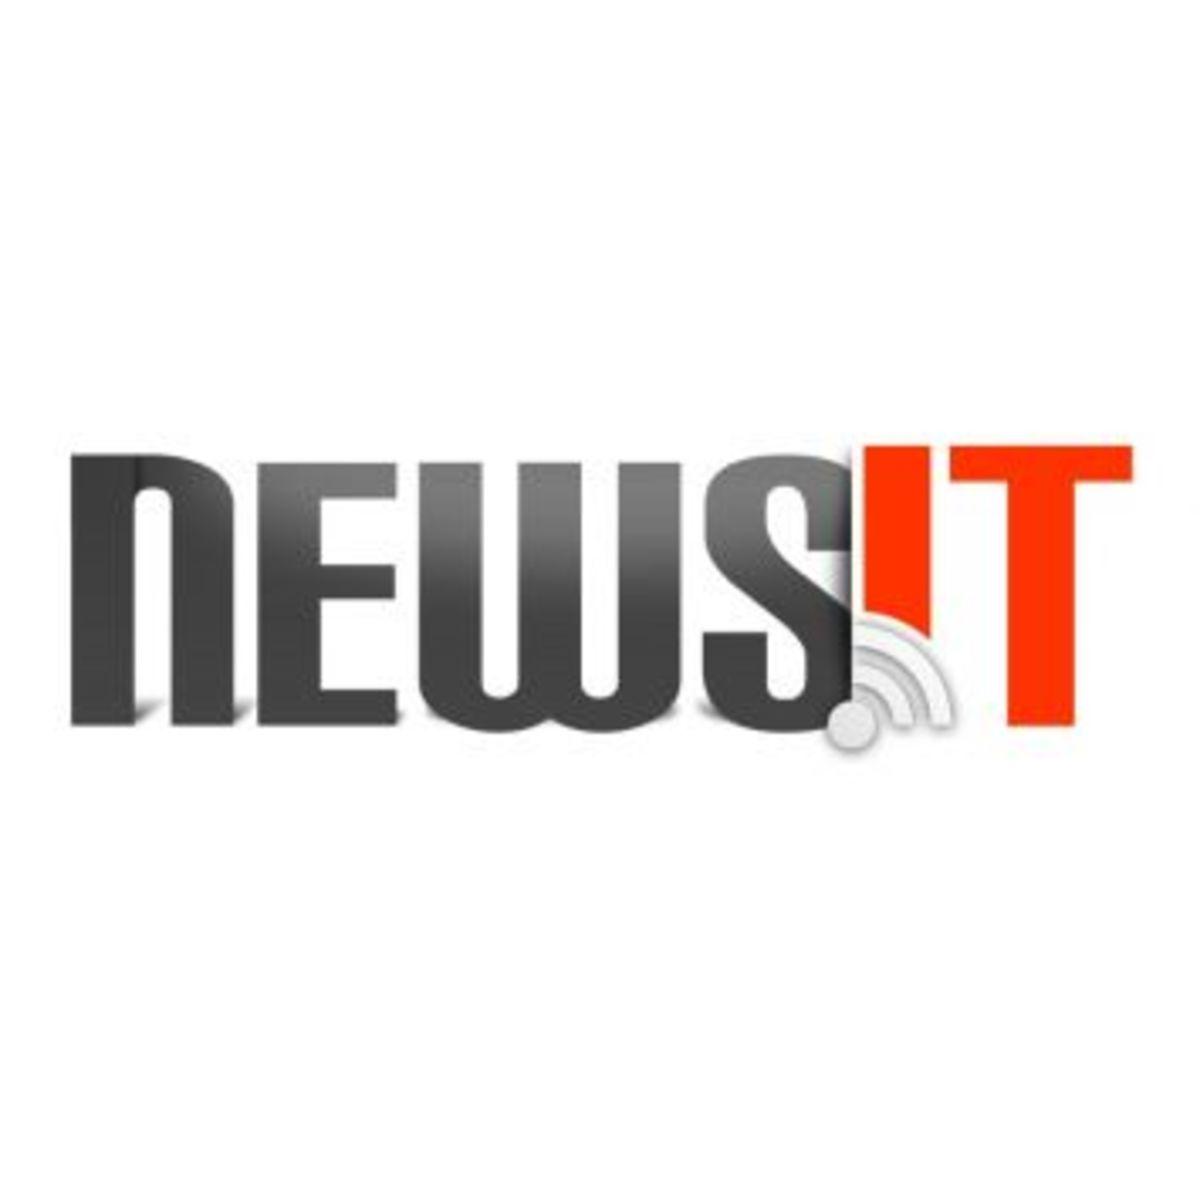 NEWSIT: Δεν φέρουμε ευθύνη για τα τεχνικά προβλήματα | Newsit.gr